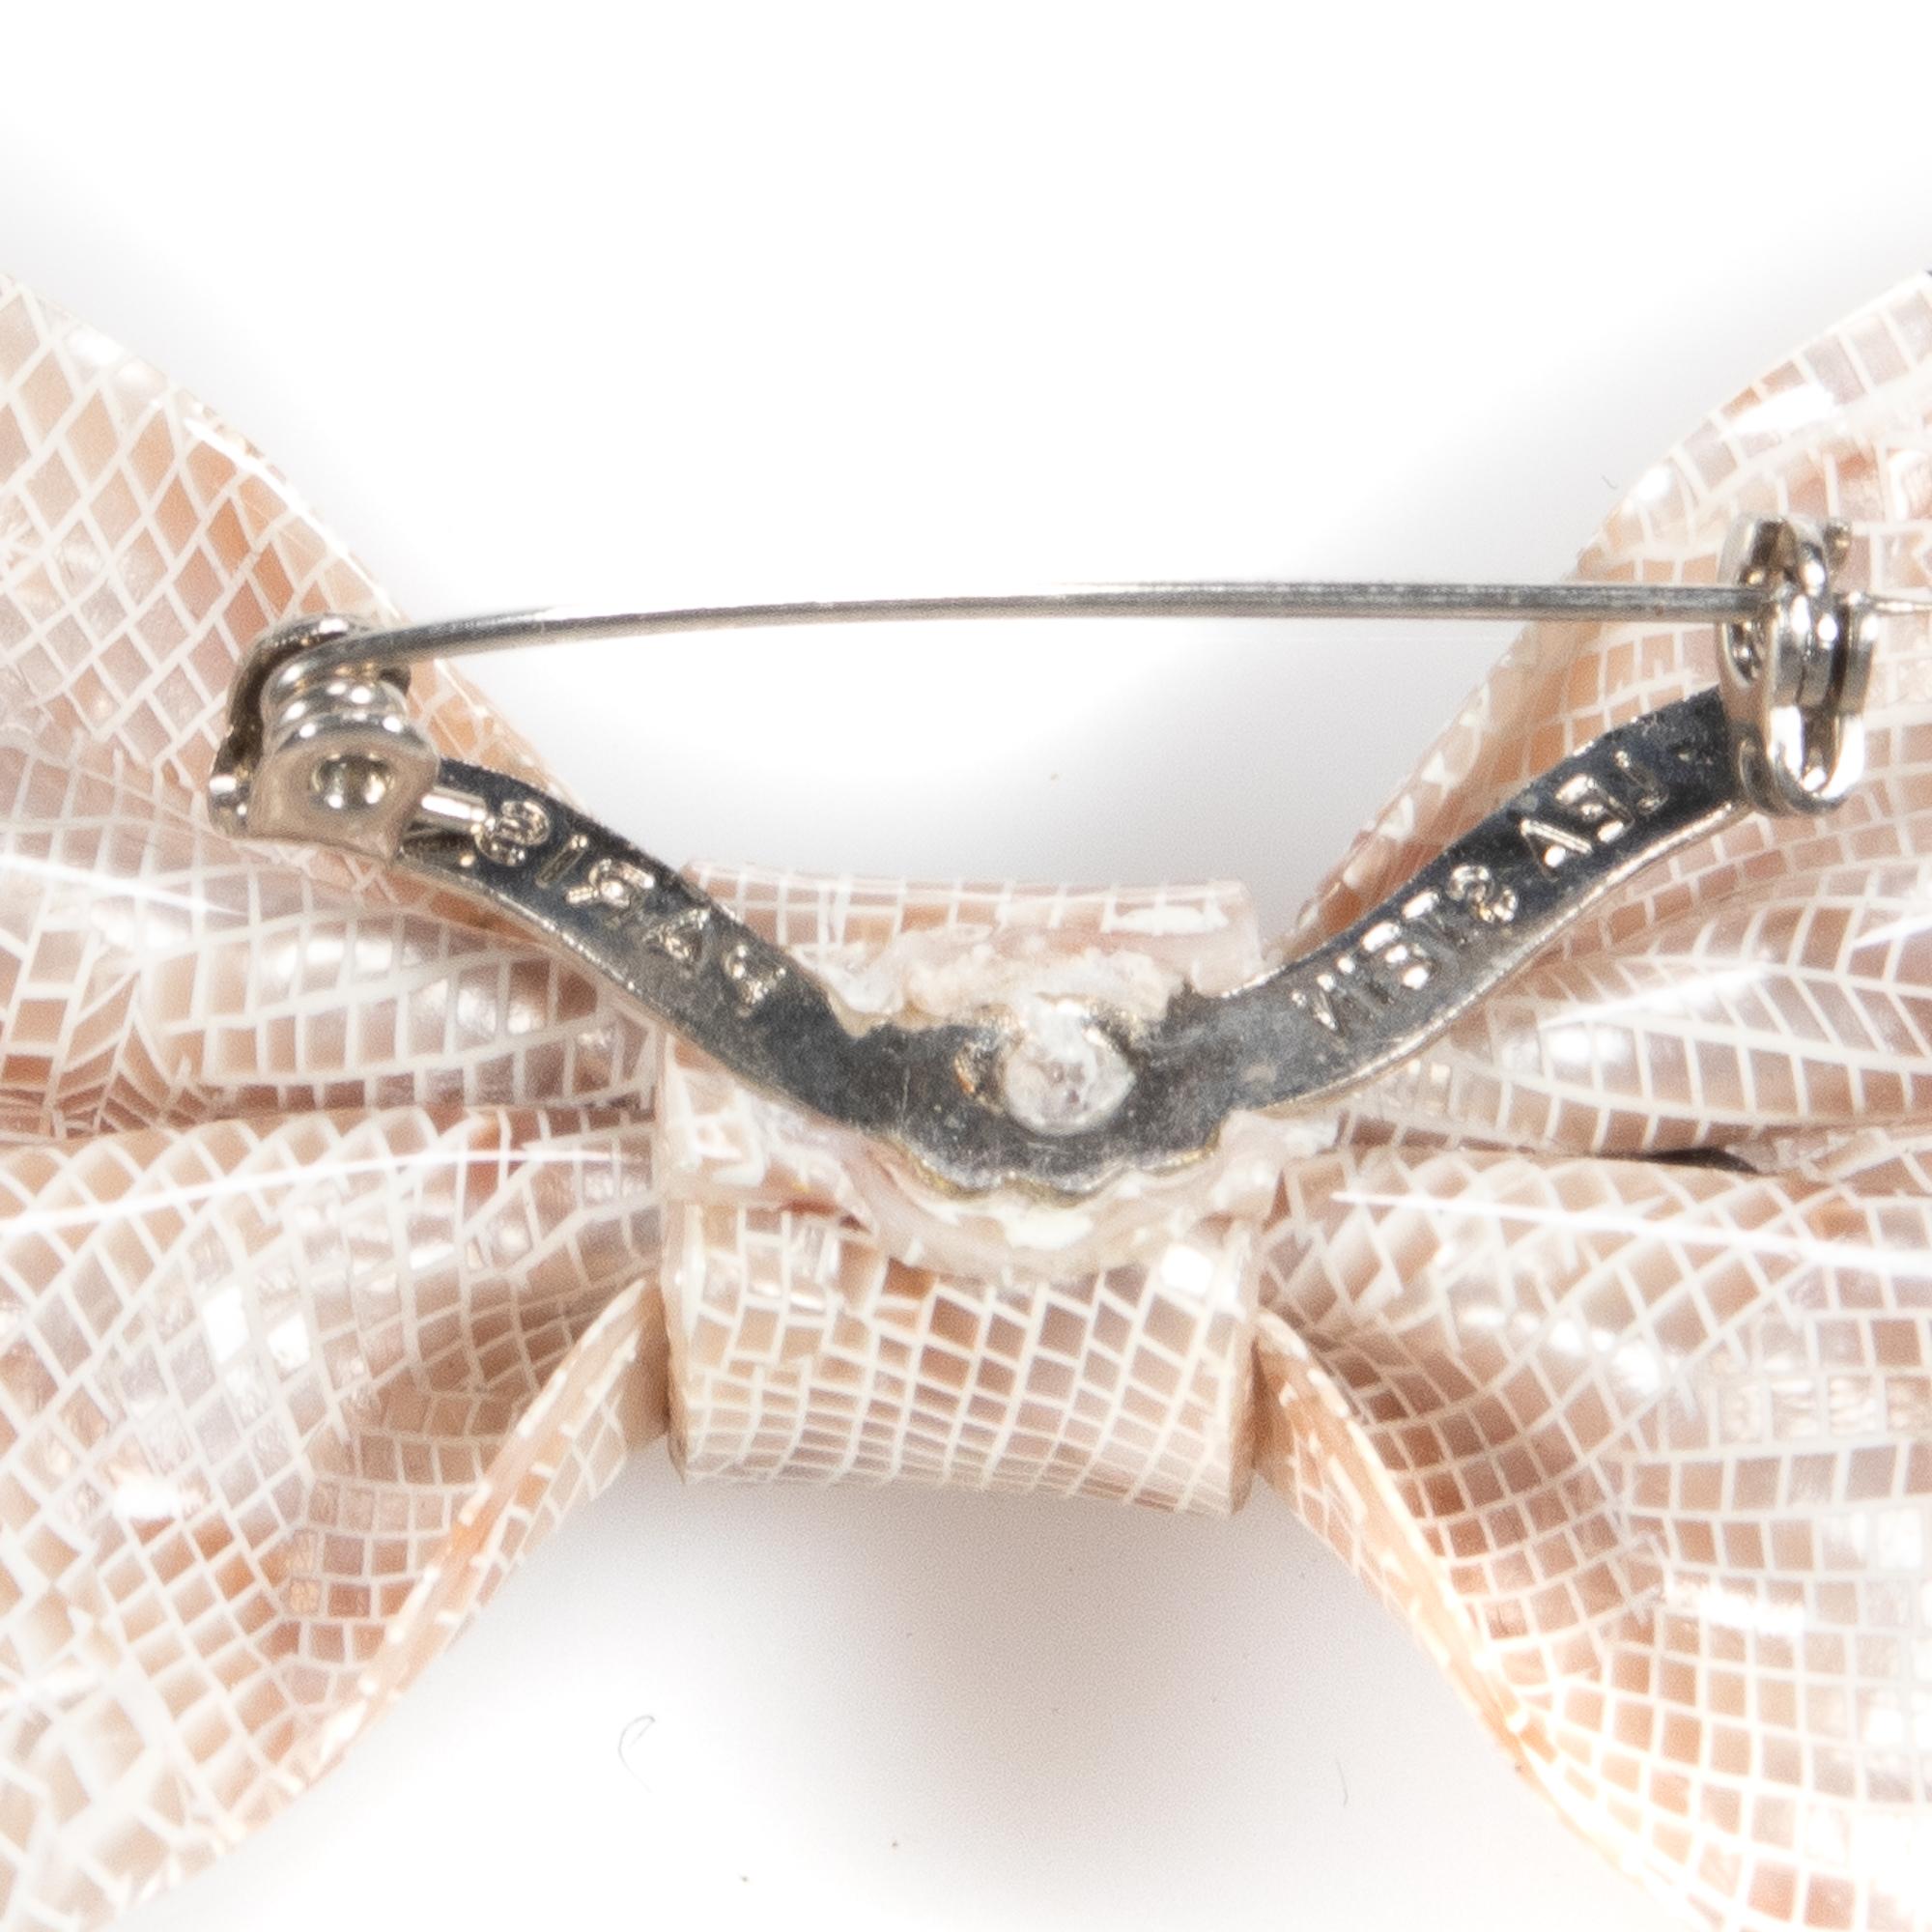 Lea Stein Signed Paris Bakelite Designer Brooch - Image 6 of 6